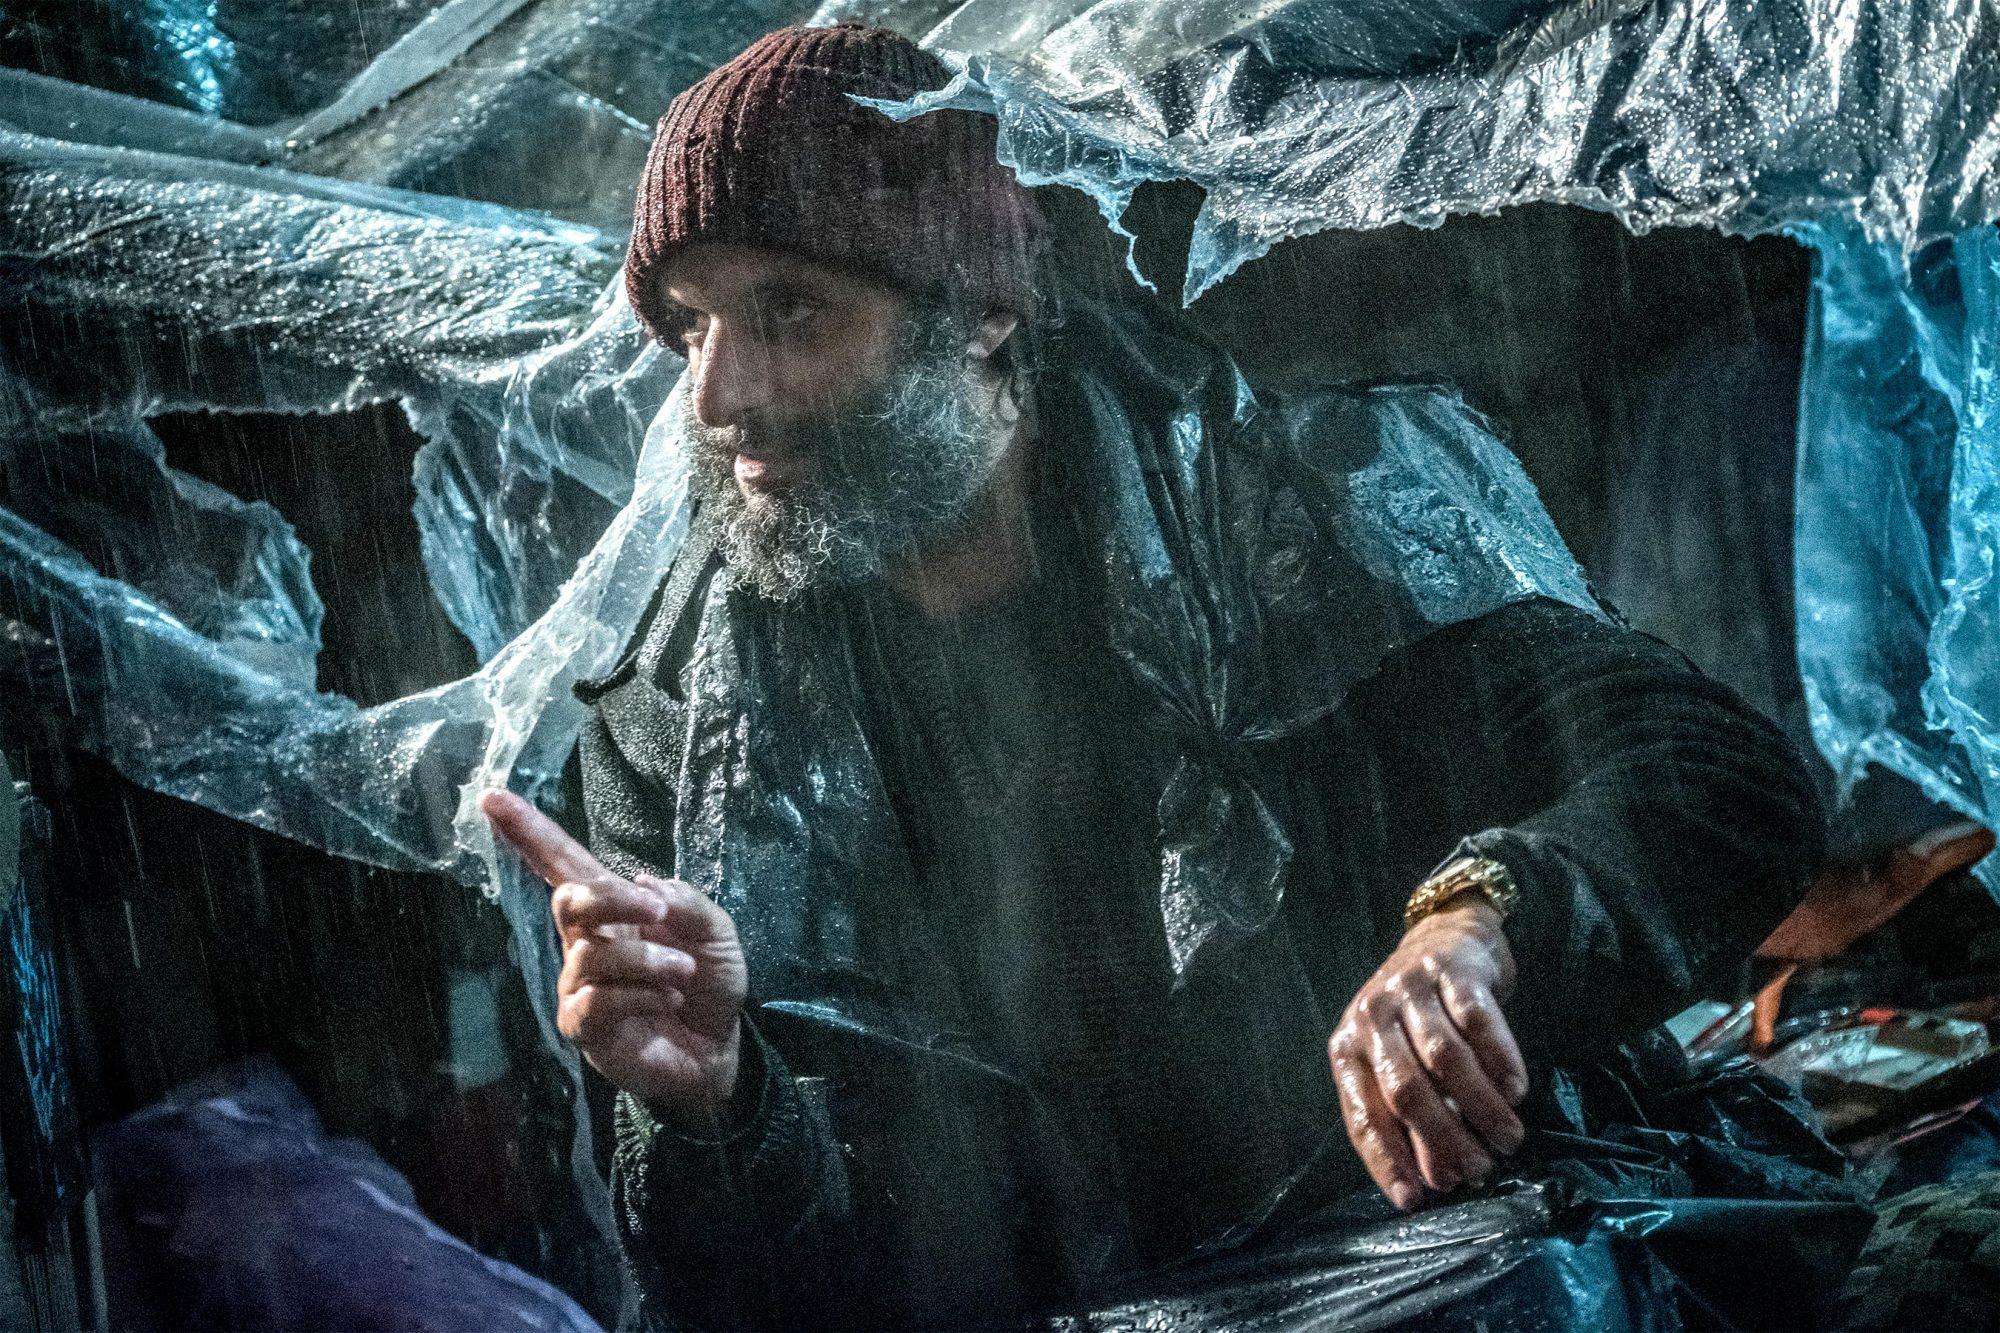 Jason Mantzoukas stars as 'The Tick Tock Man' in JOHN WICK: CHAPTER 3 - PARABELLUM. Photo Credit: Niko Tavernise.